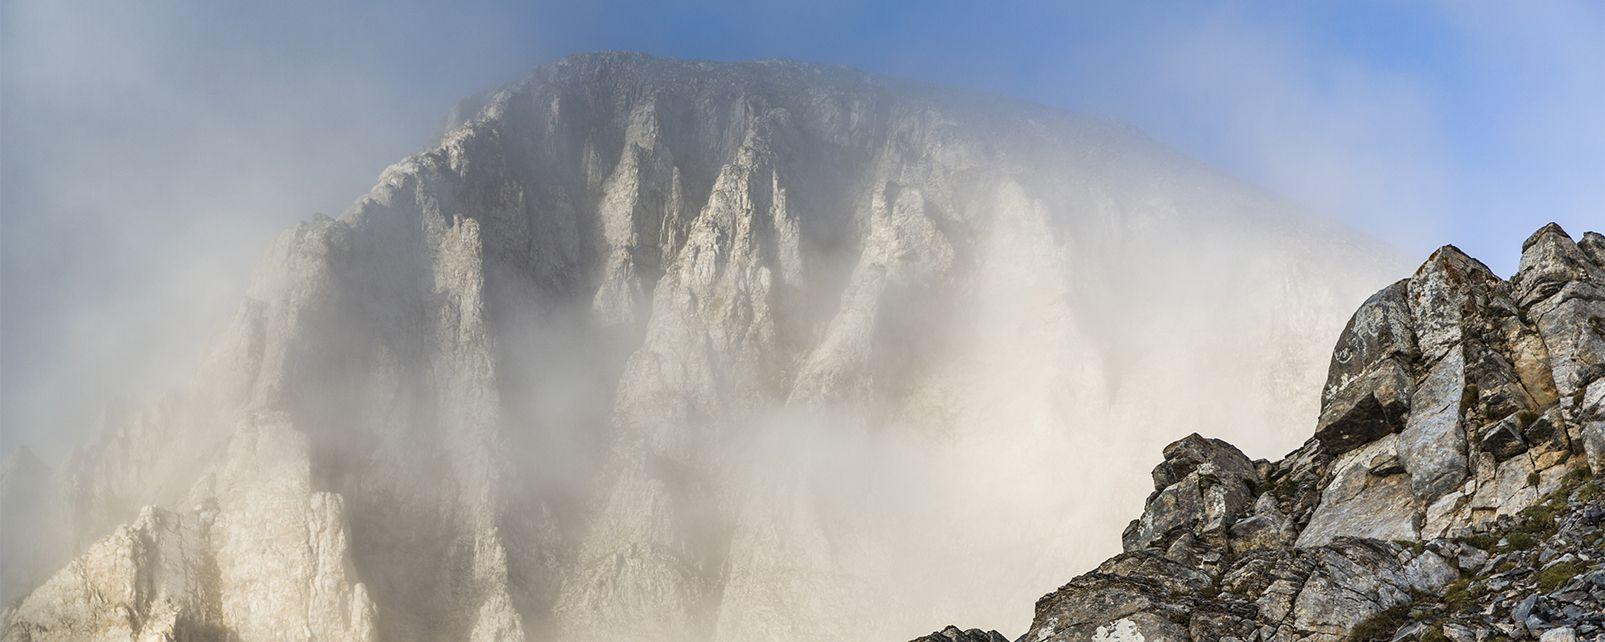 Le Mont Olympe , Le mont Olympe , Grèce